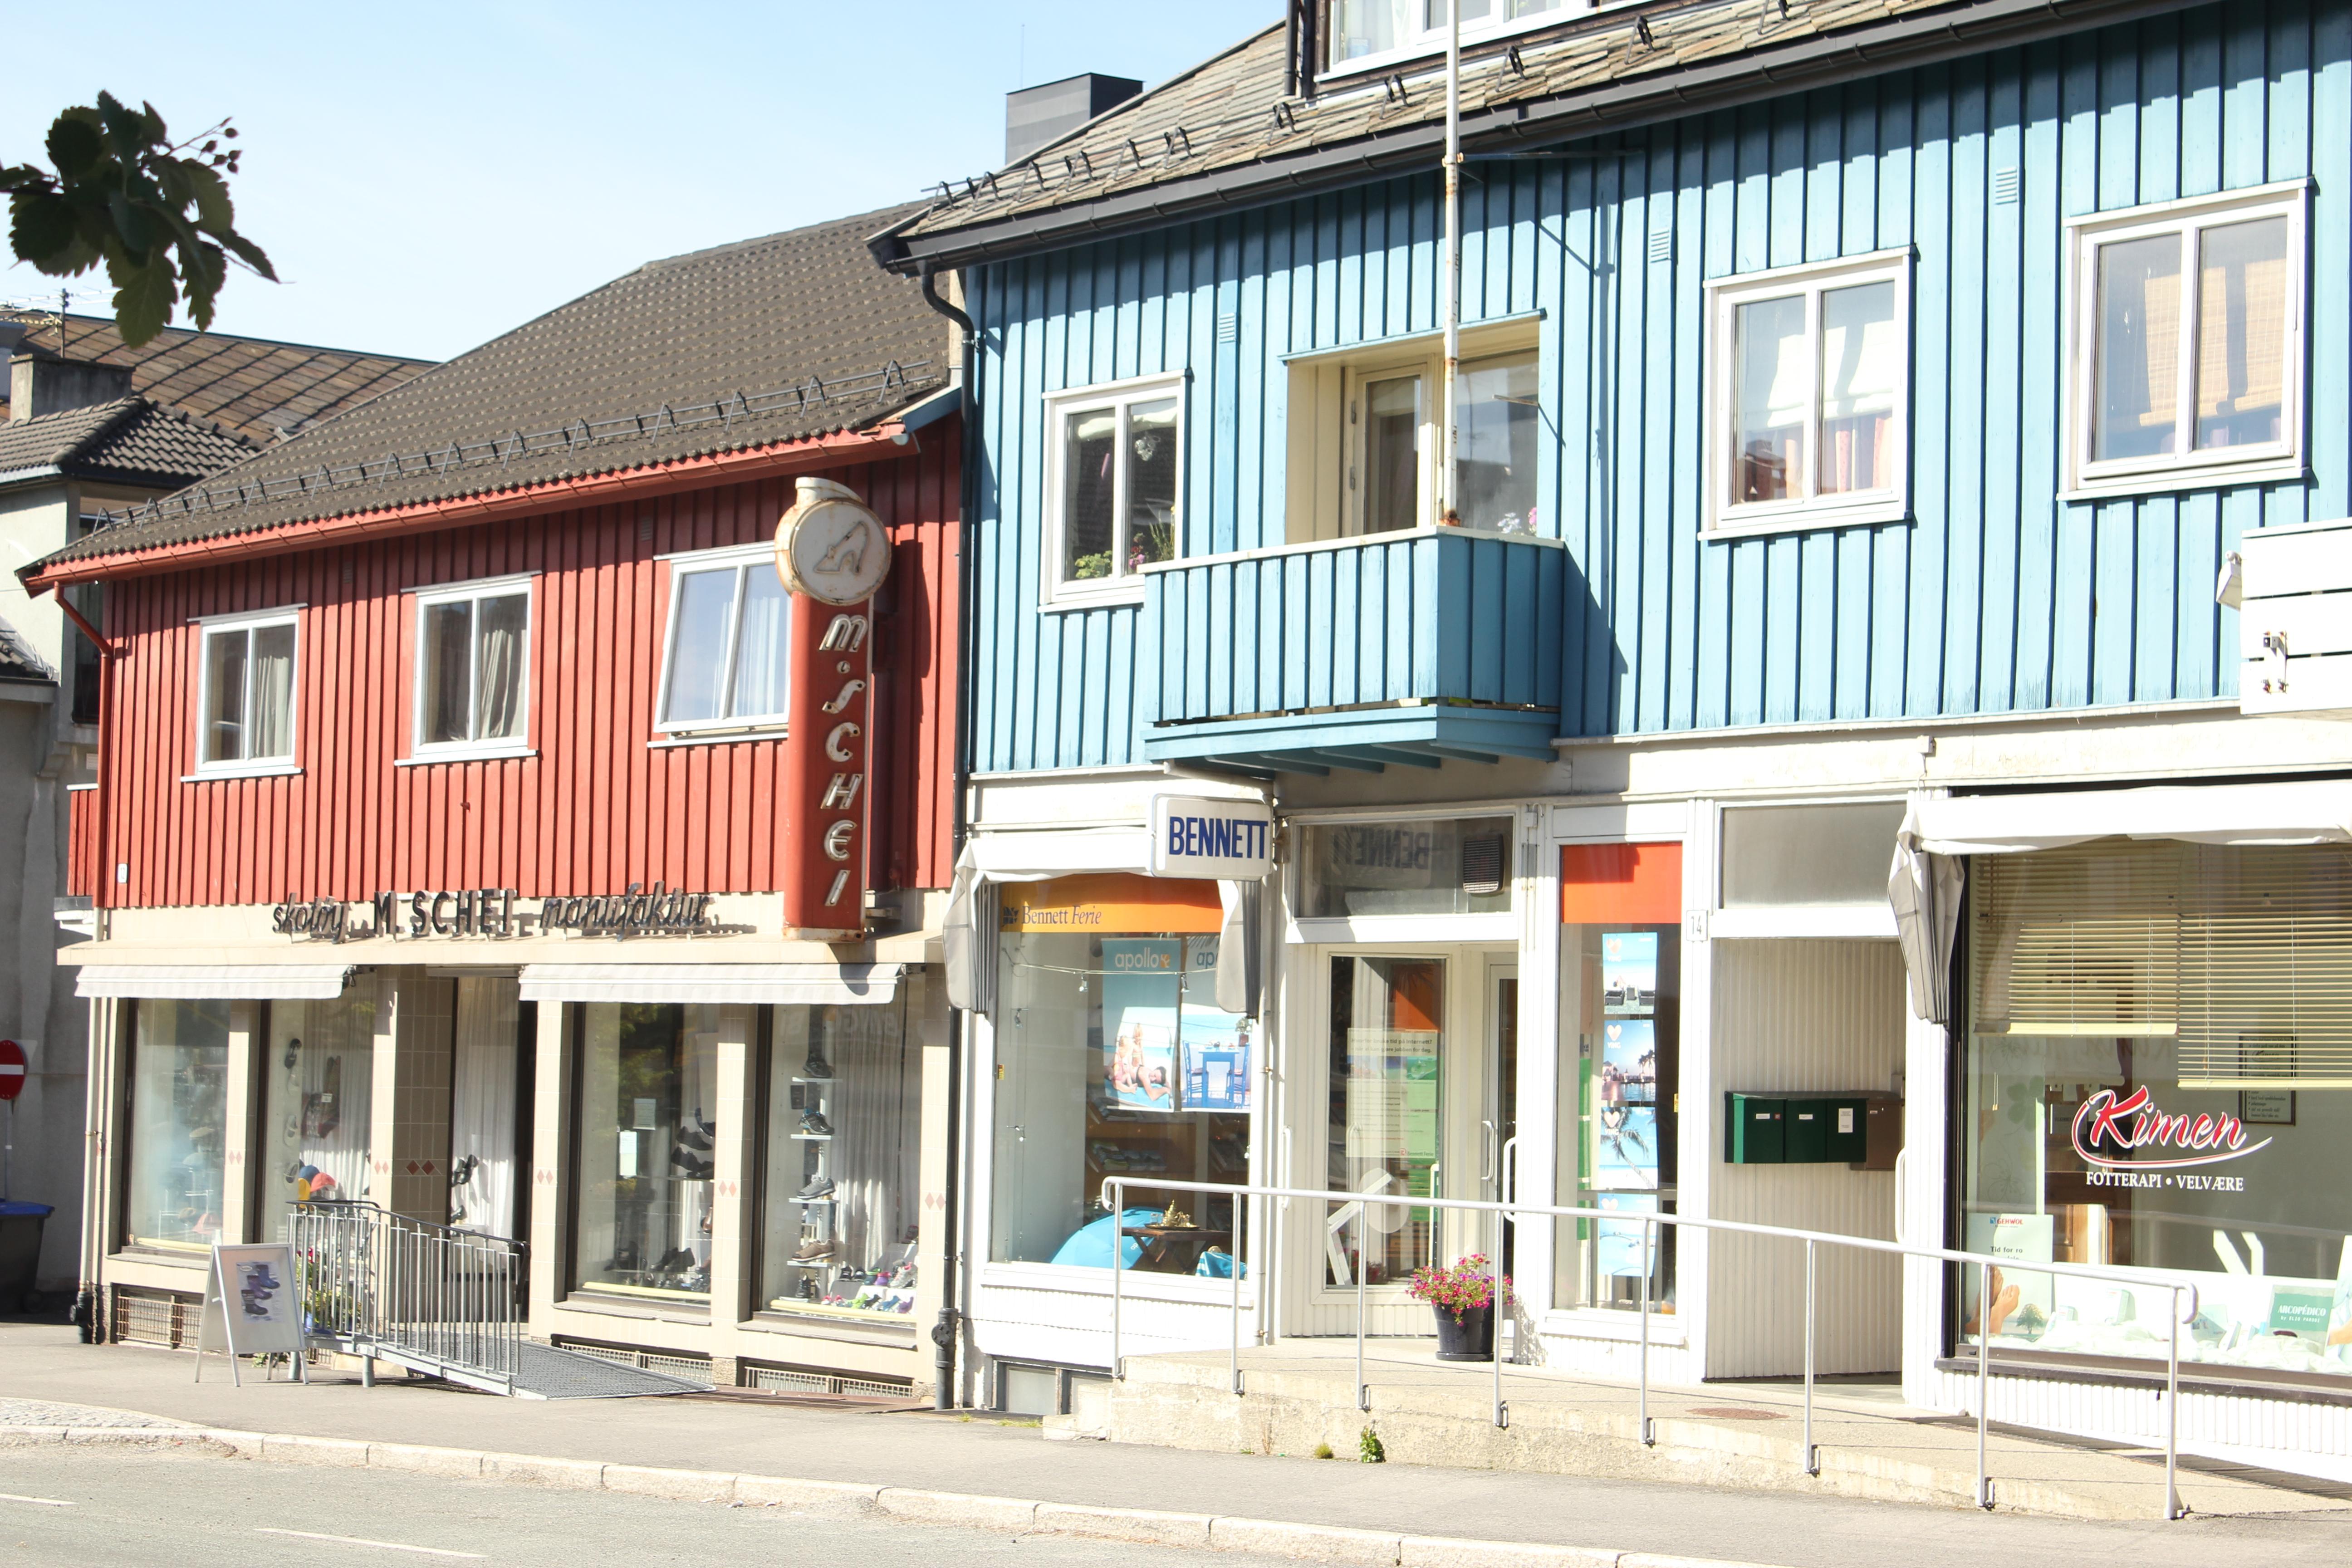 Steinkjer, M schei manufactur, Gjenreisningsbyen Steinkjer, second world war, Trondheim, Steinkjer, Innherred